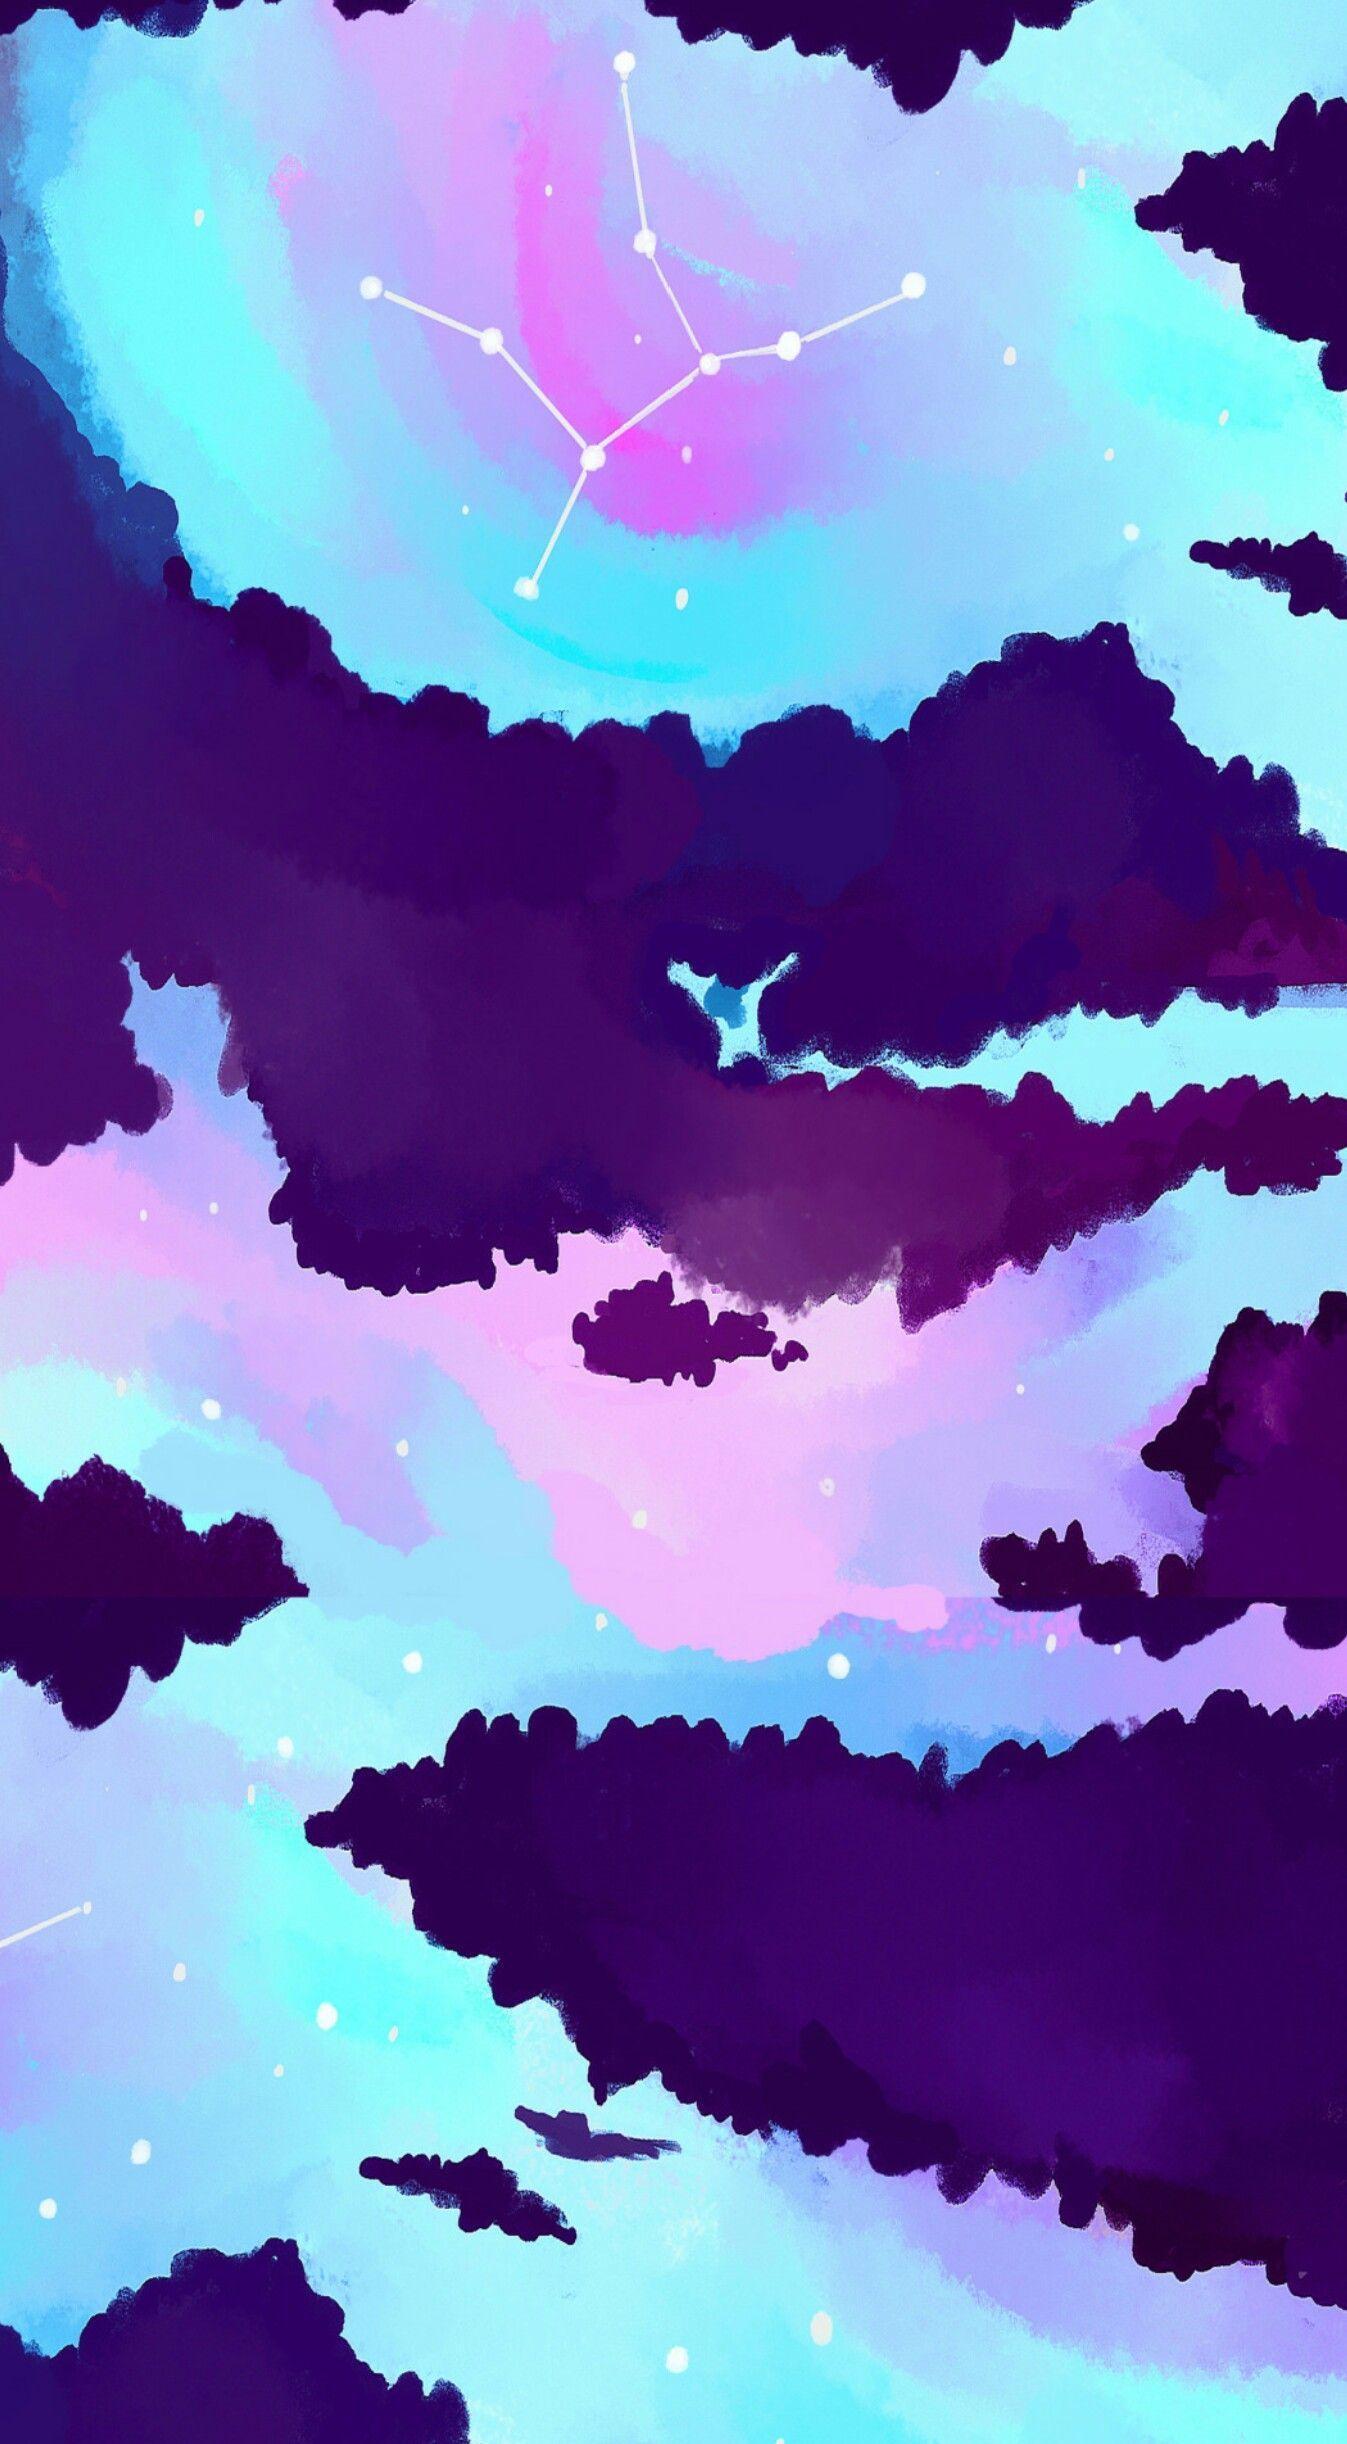 Colorful Skies Libra Wallpapers Top Free Colorful Skies